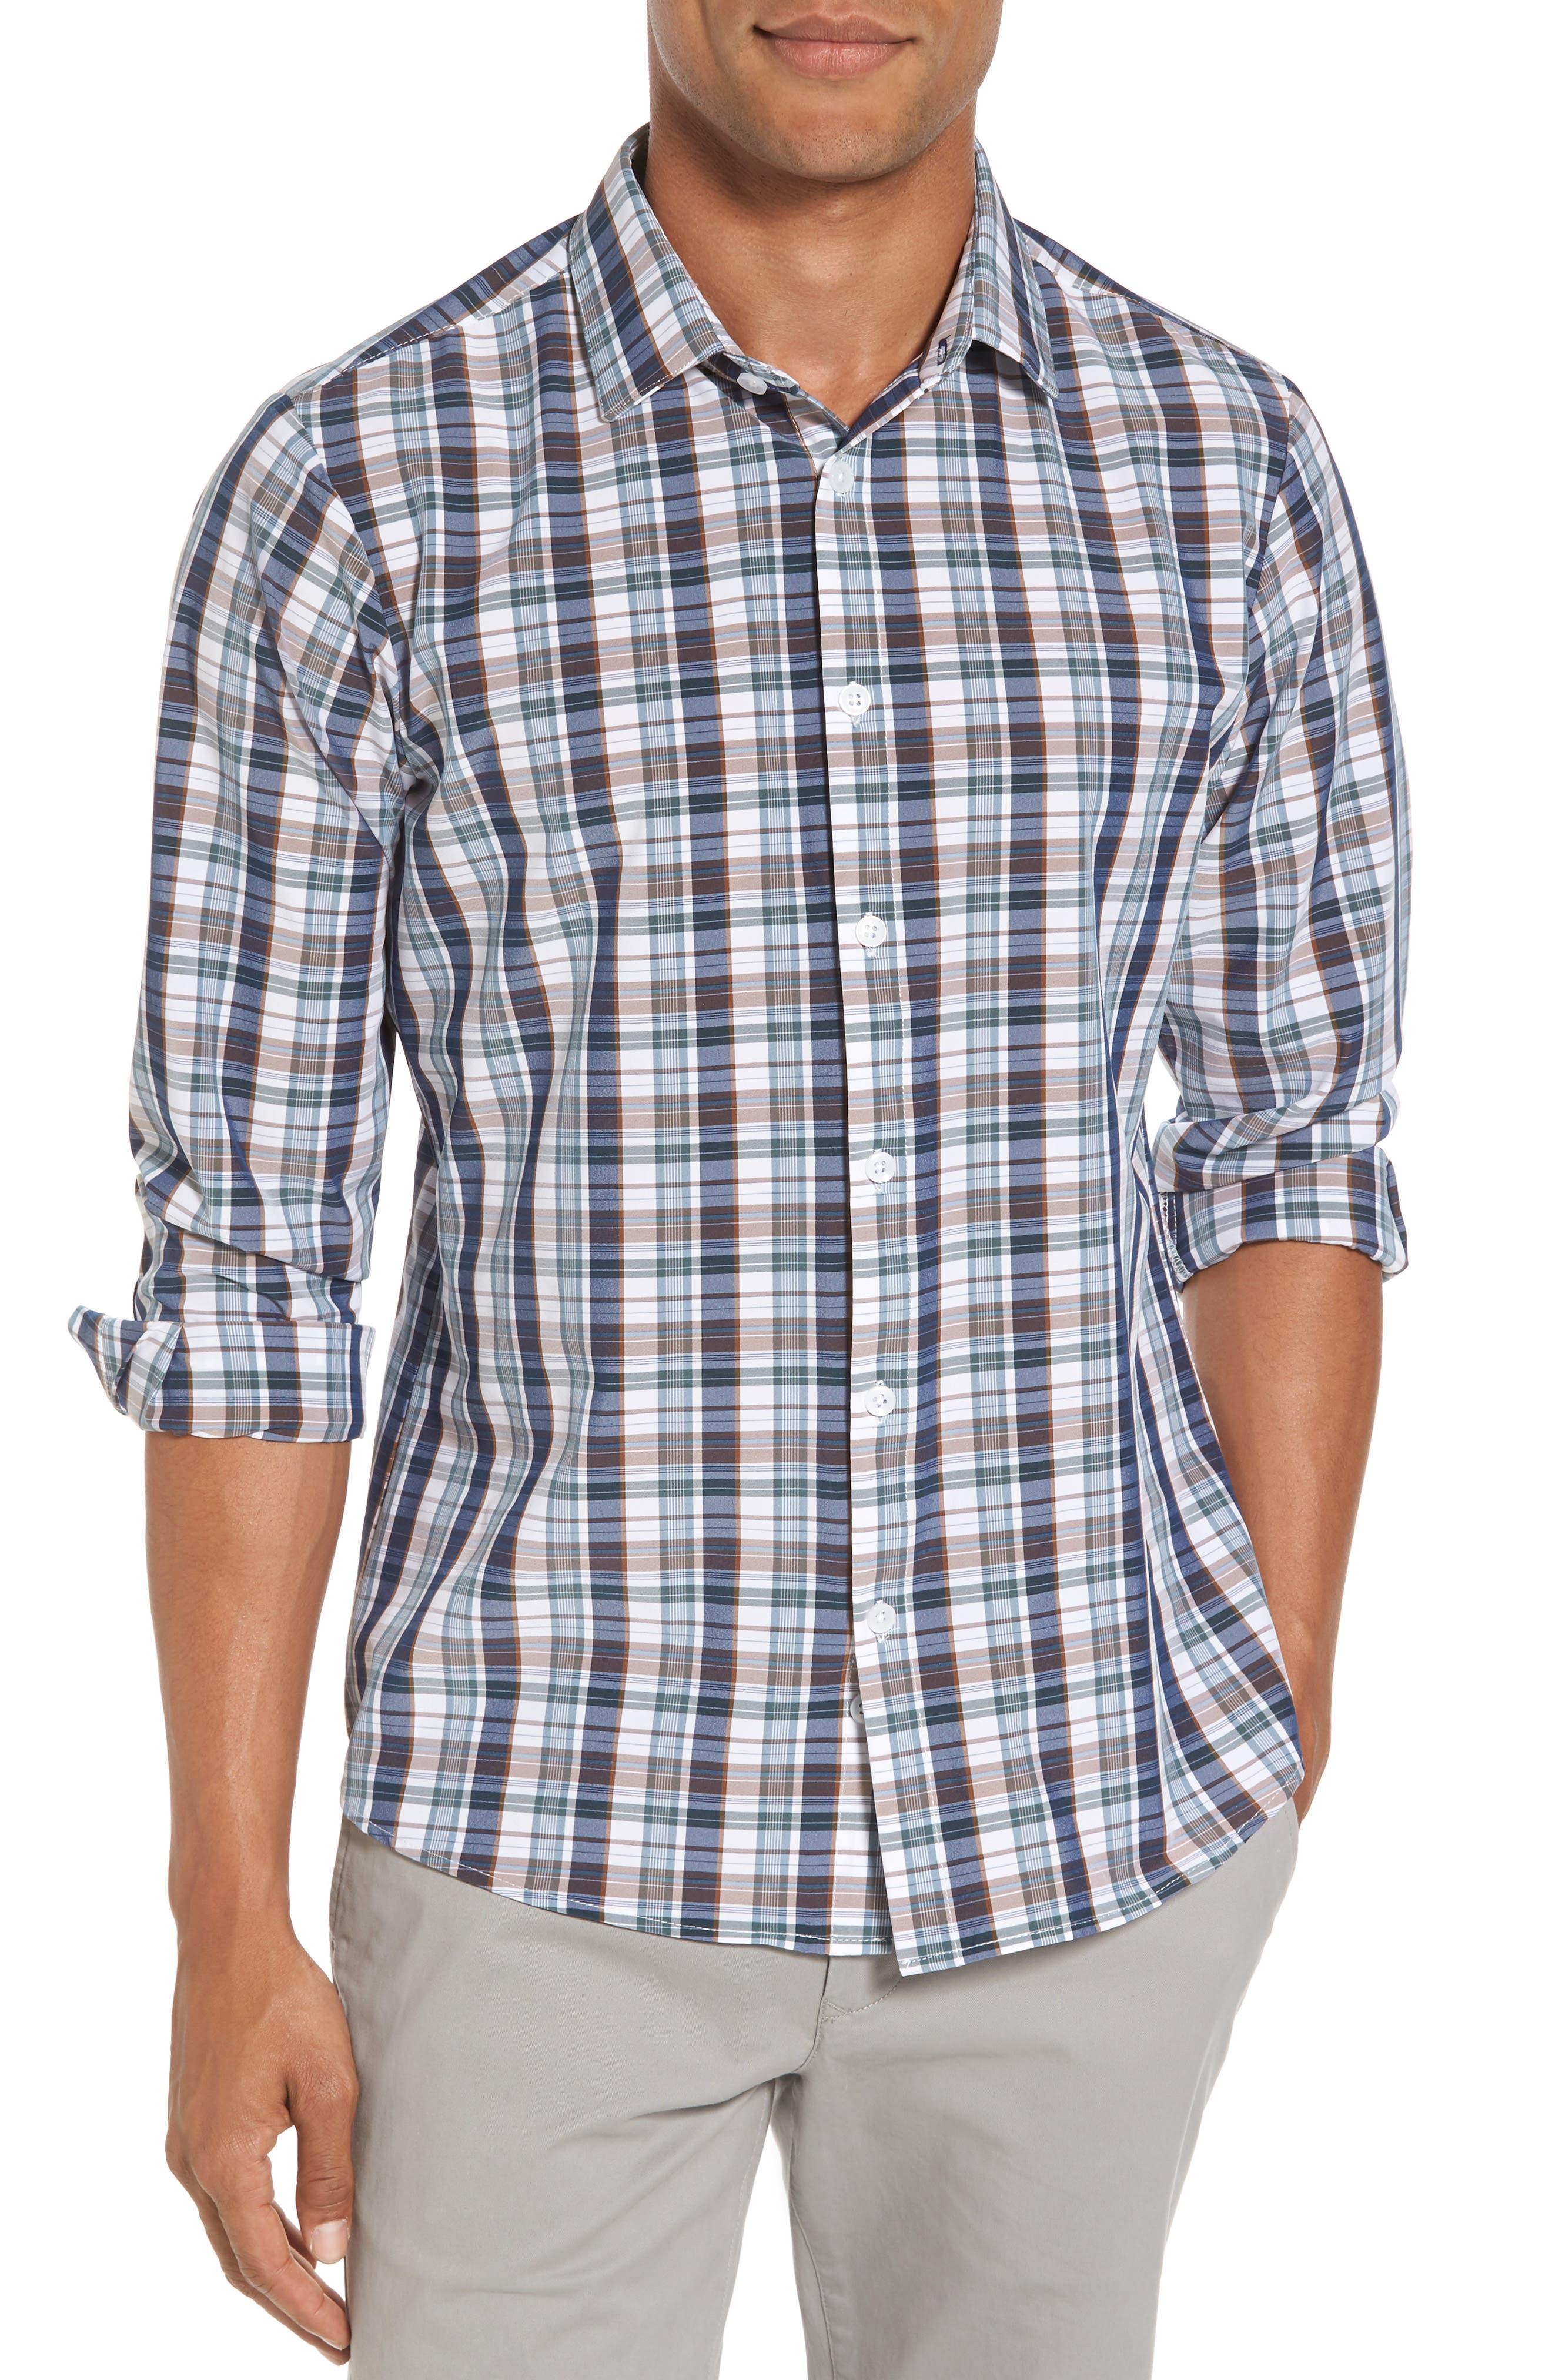 Alternate Image 1 Selected - Mizzen+Main Russell Madras Plaid Performance Sport Shirt (Regular & Tall)